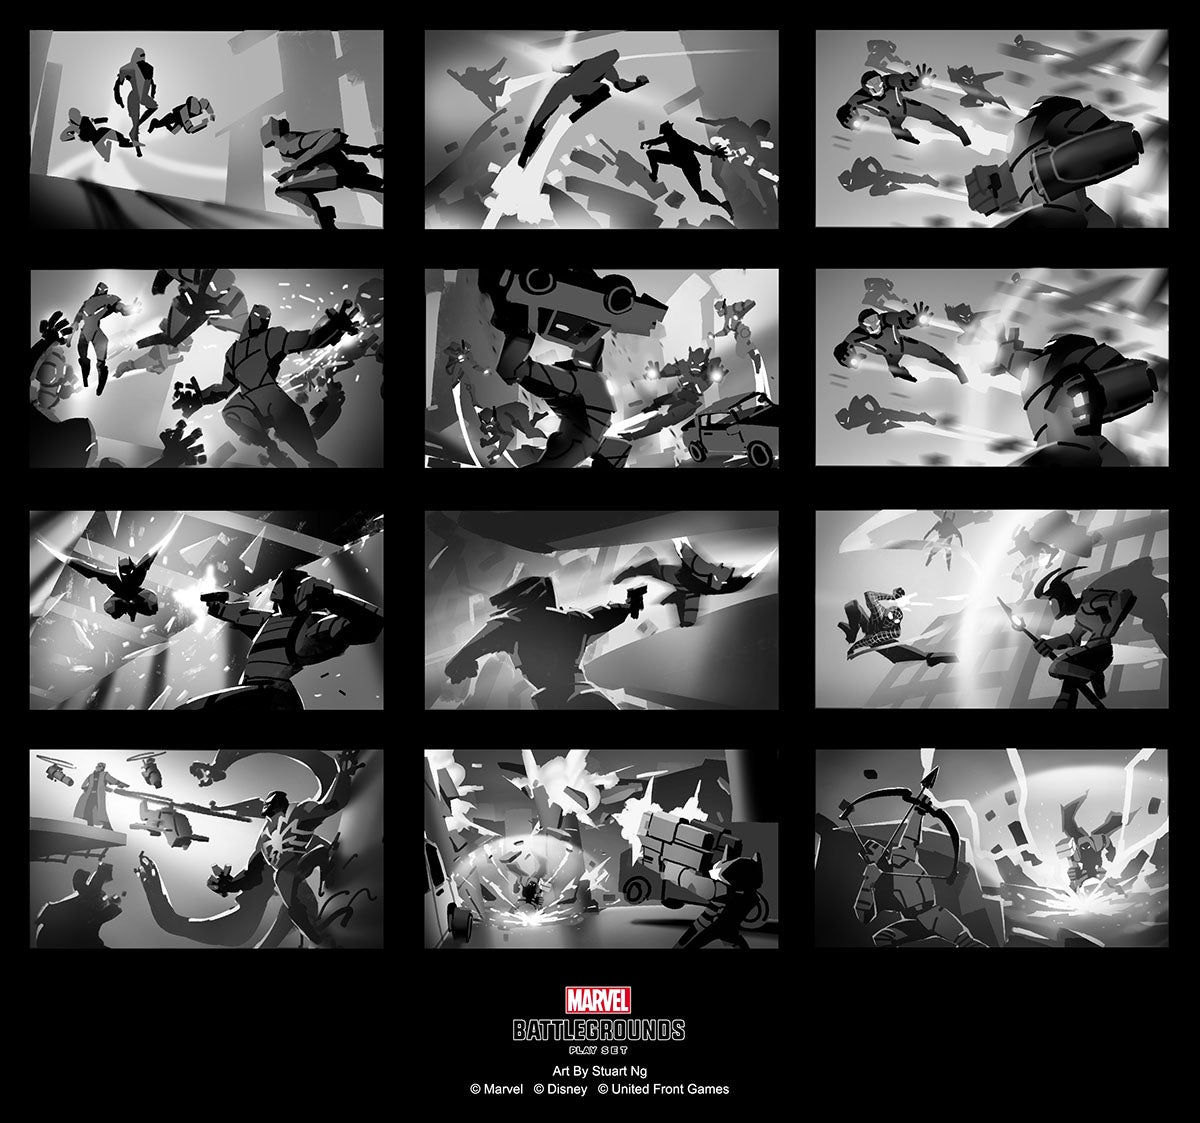 Captain America: Civil War? More Like Battle Royale.